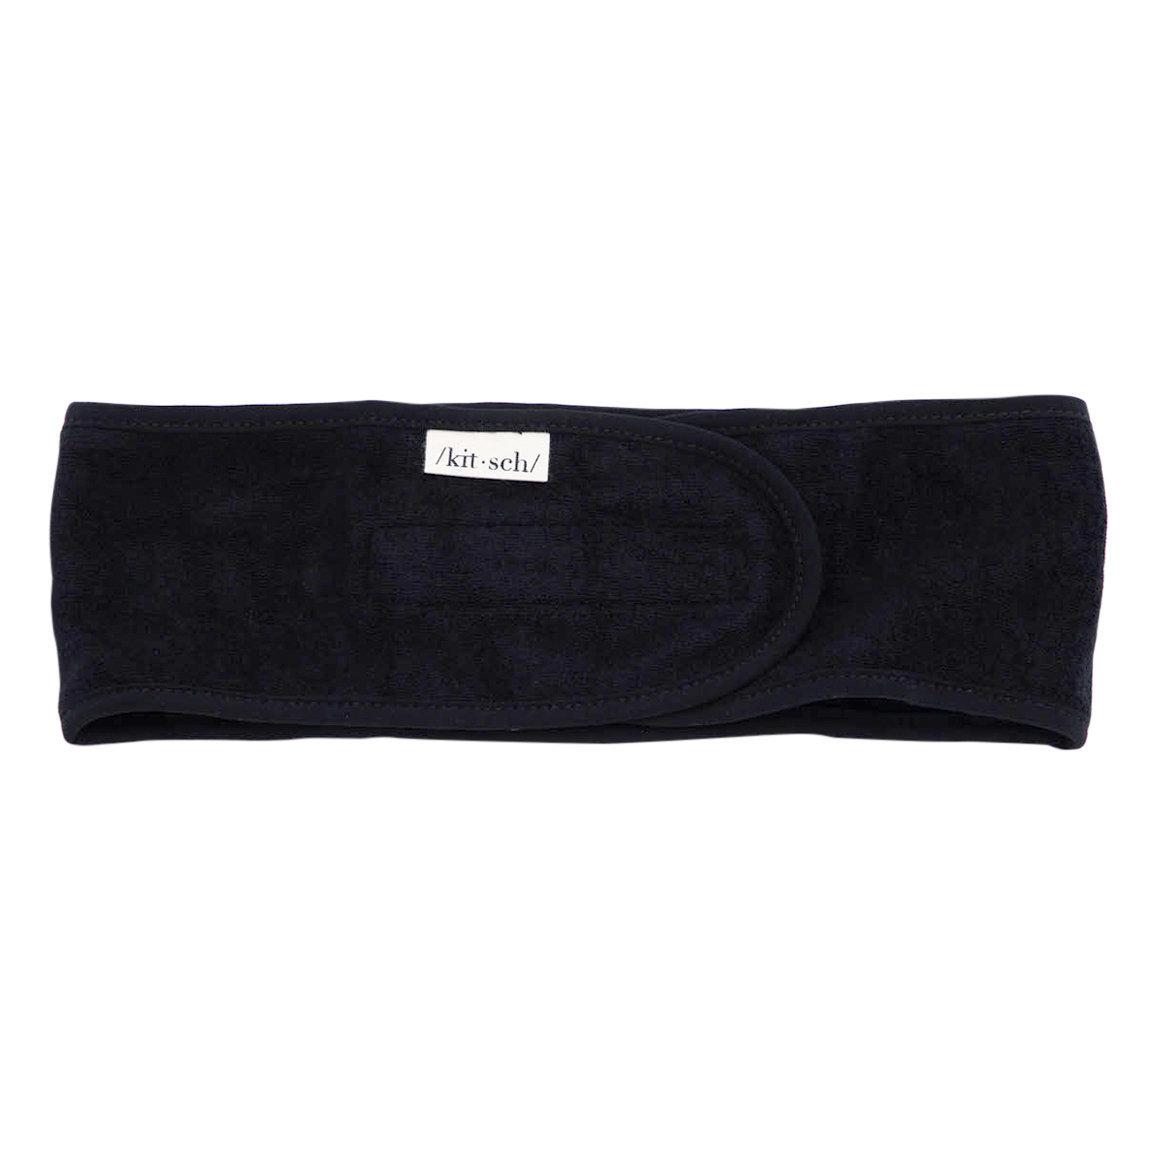 Kitsch Eco-Friendly Spa Headband Black alternative view 1 - product swatch.